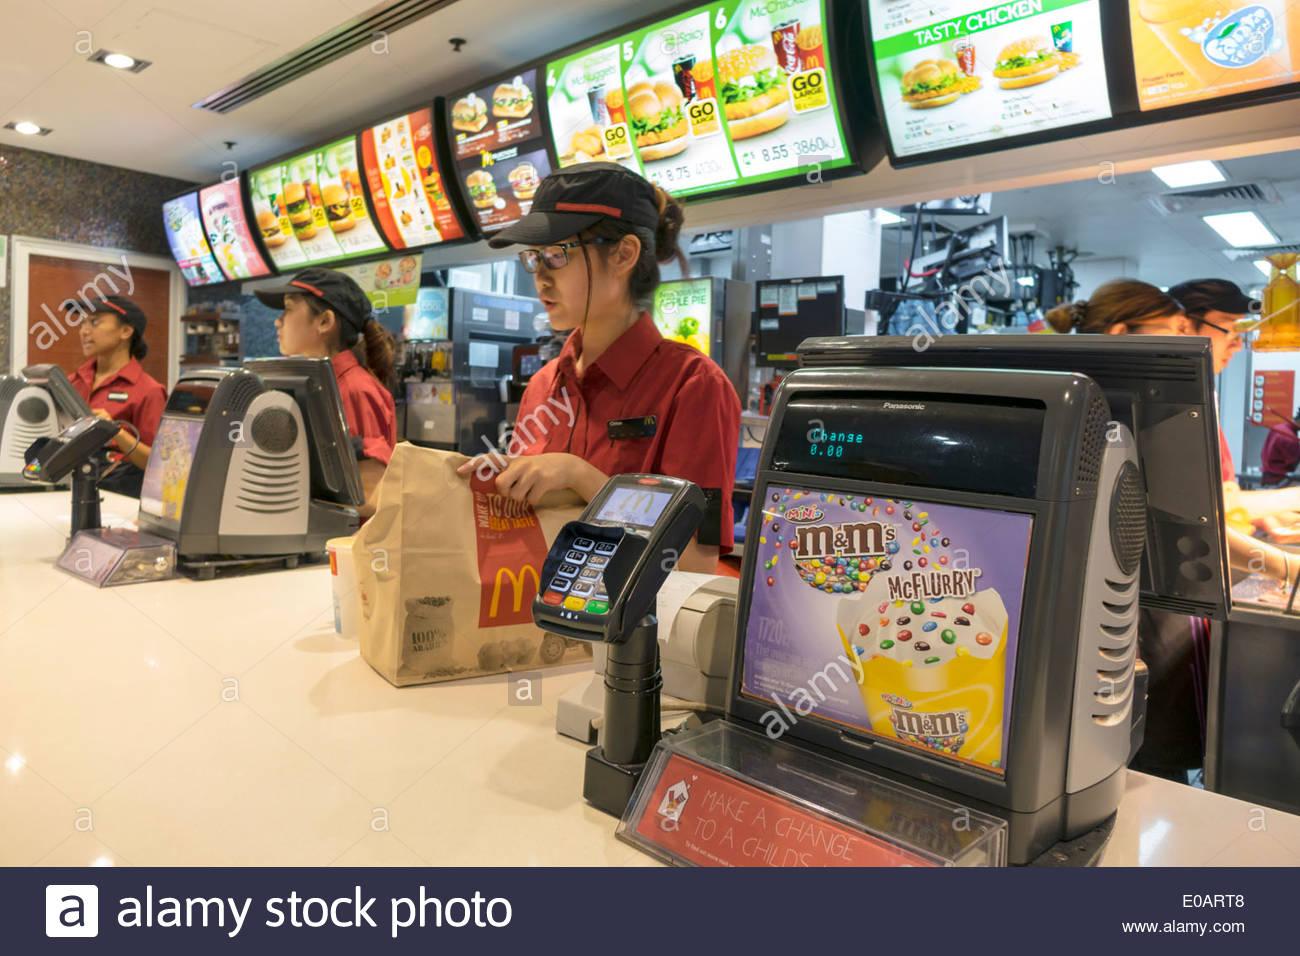 Sydney Australien NSW neue South Wales CBD zentralen Geschäft Bezirk Circular Quay McDonald's Restaurant Fastfood Theke Asiatin Job einheitliche verschickt Stockbild